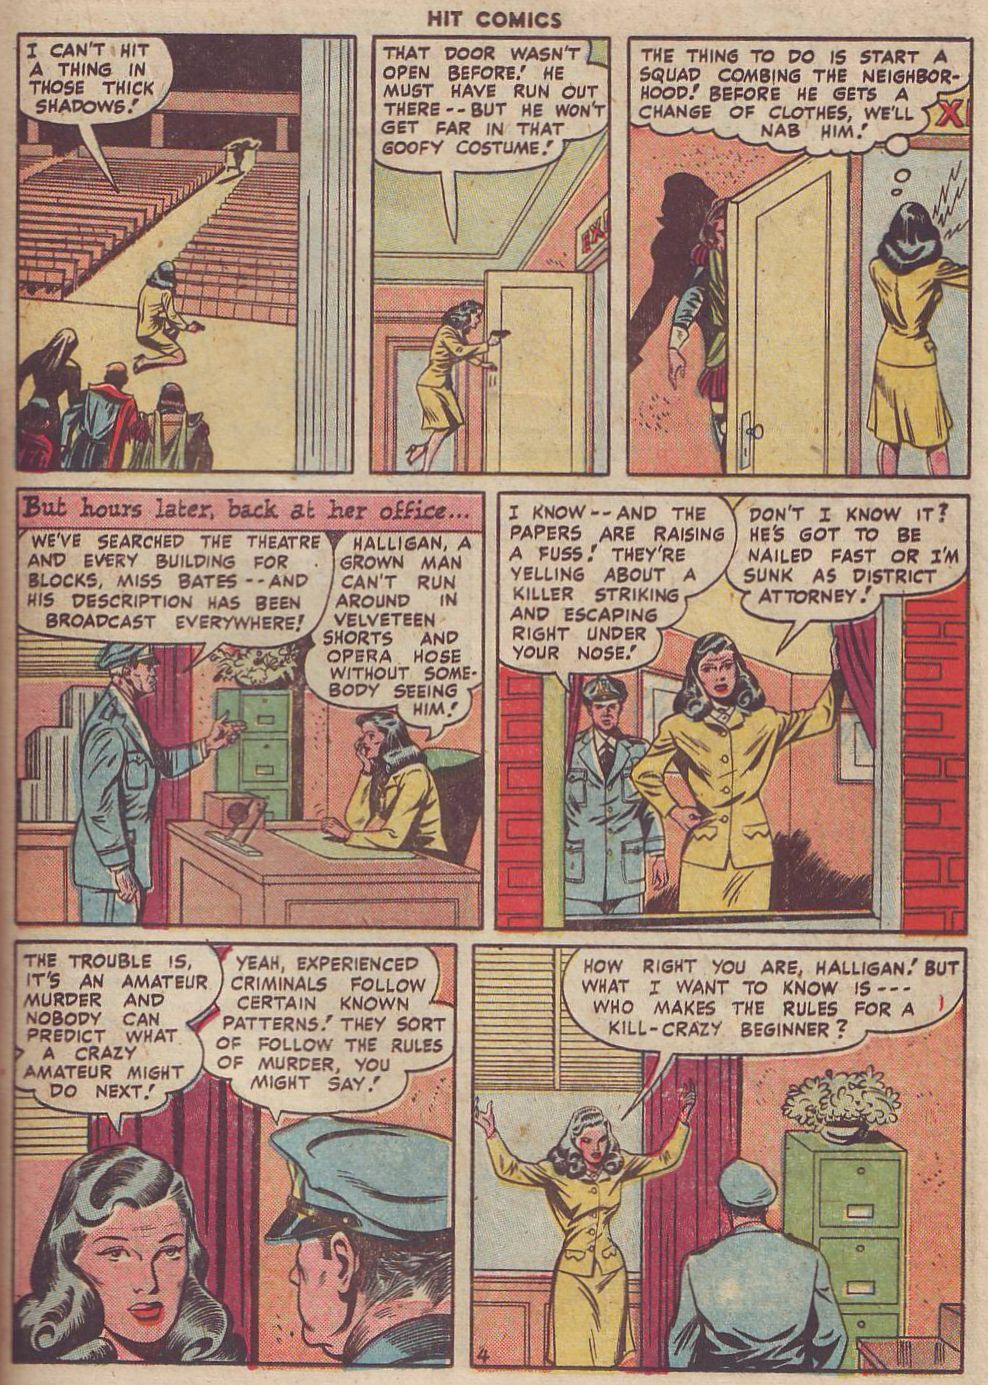 Read online Hit Comics comic -  Issue #51 - 29